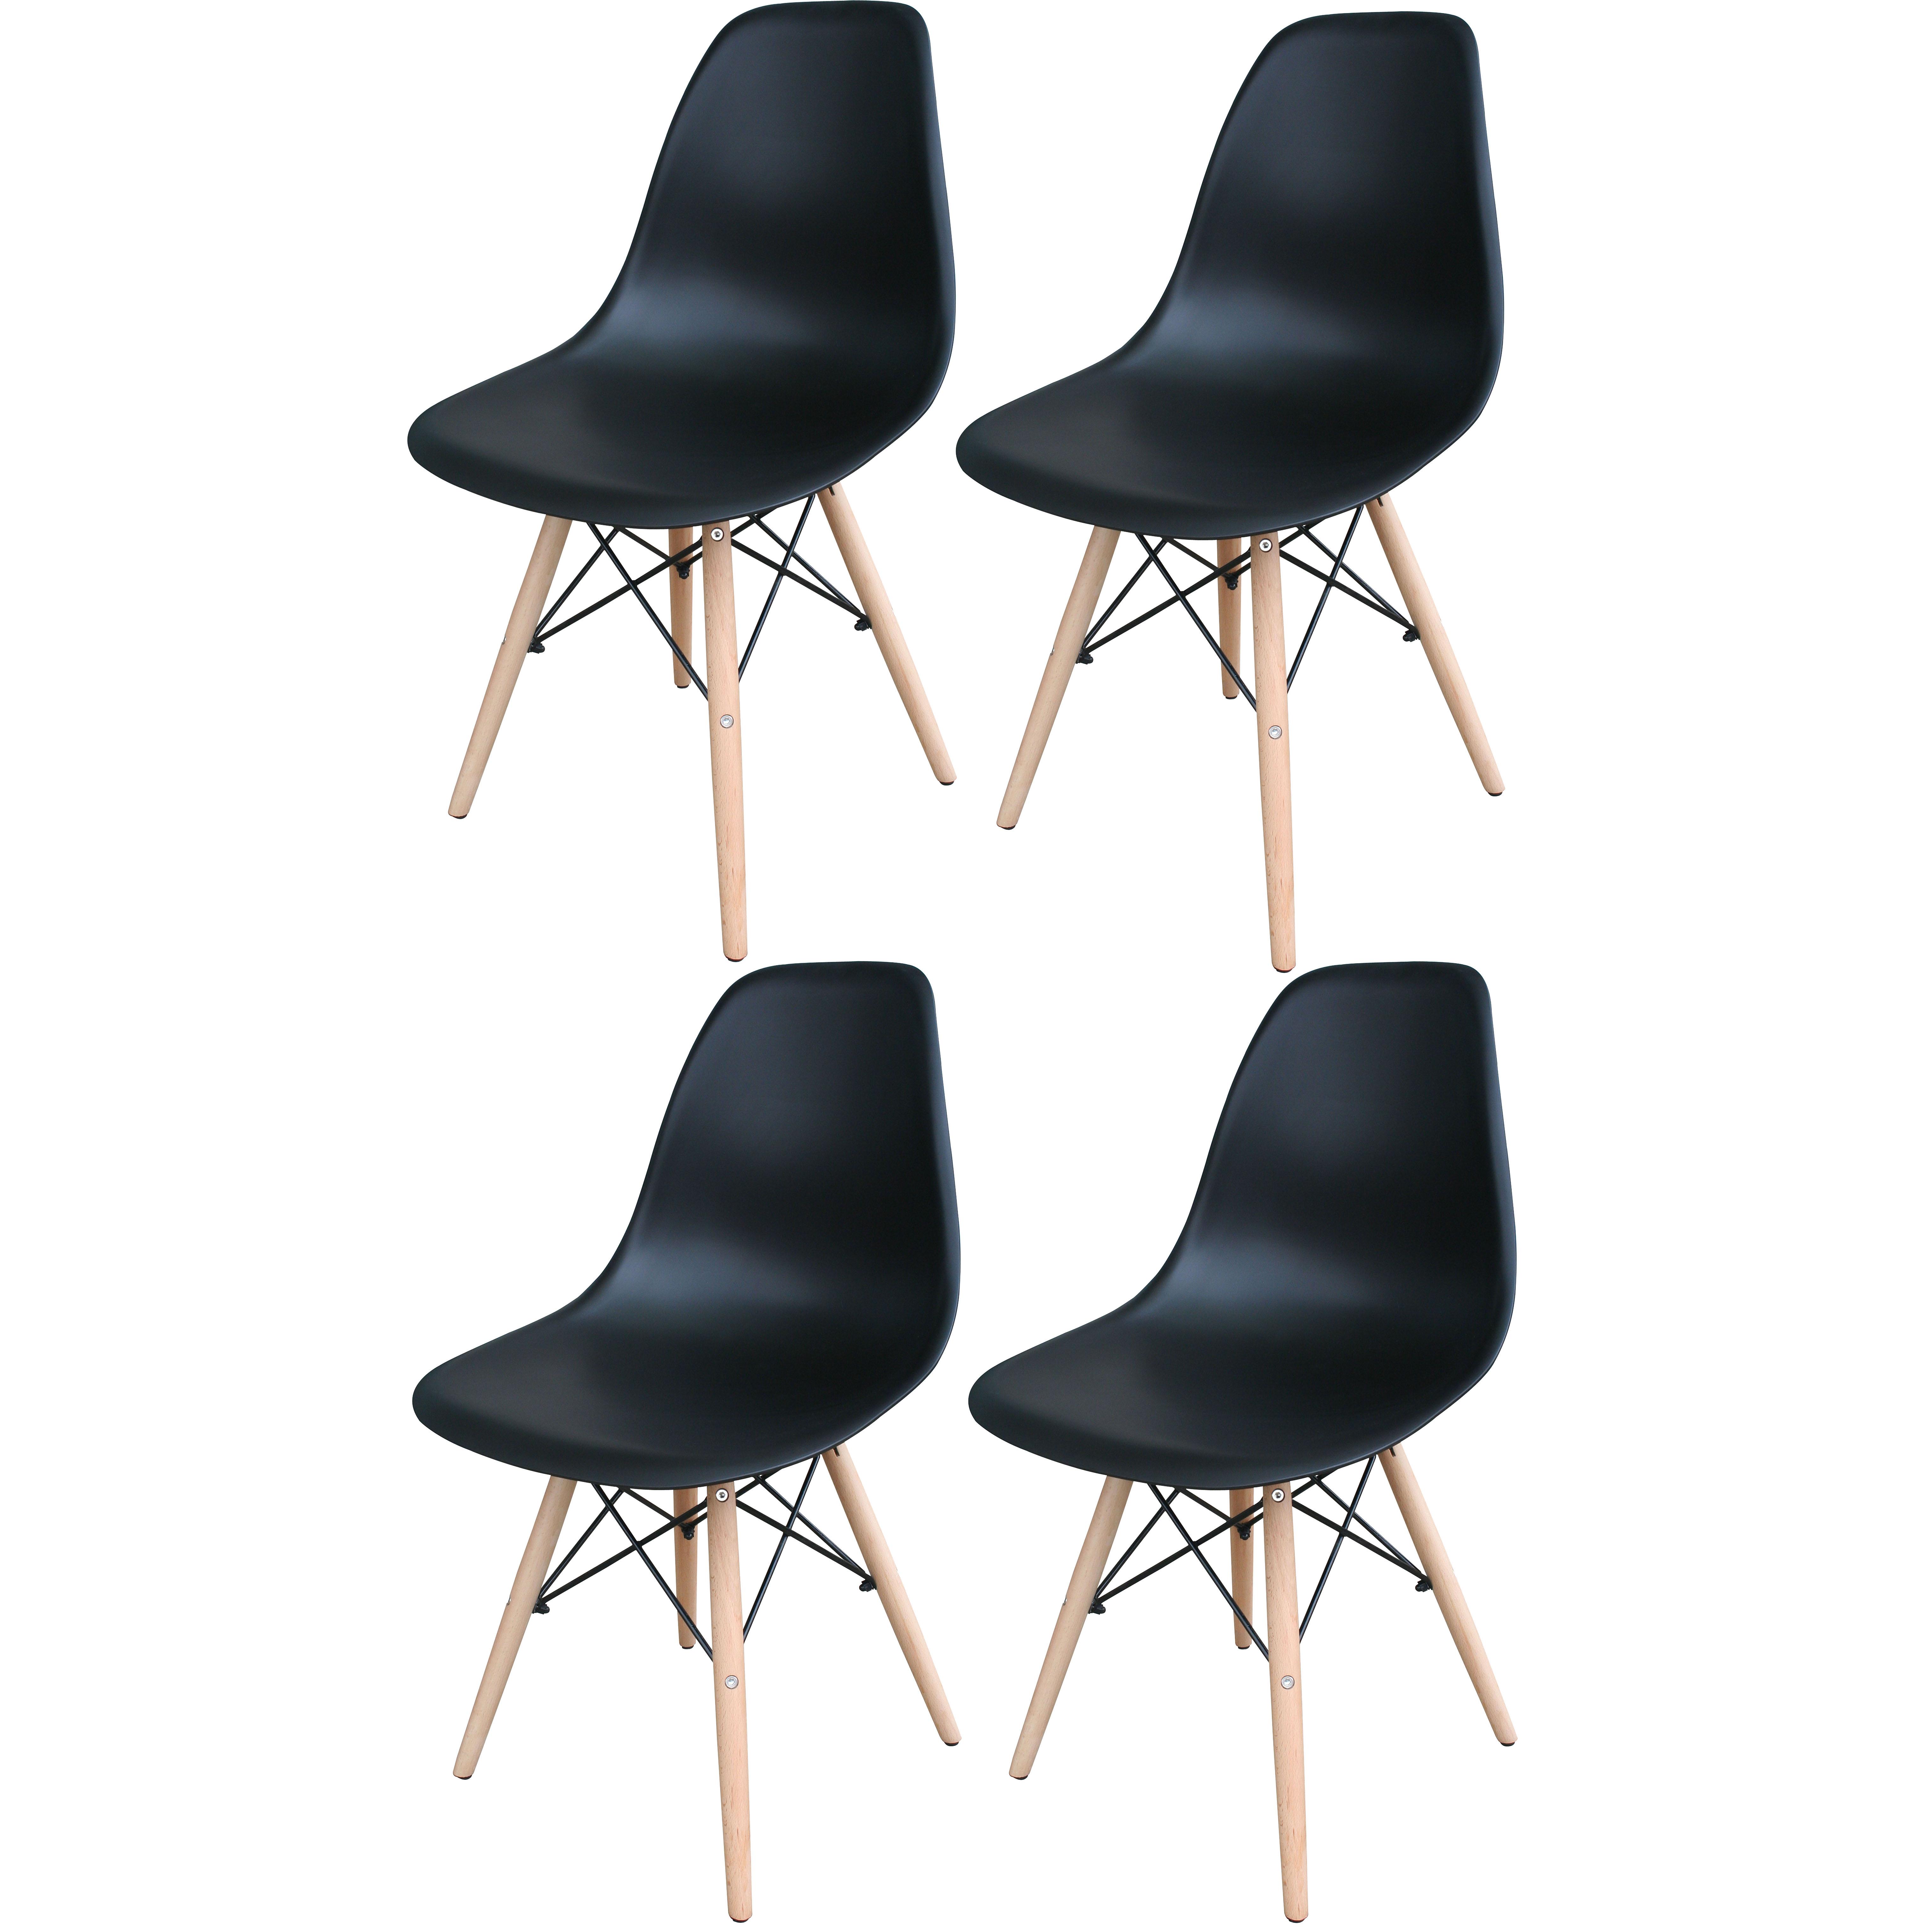 Black Wooden Leg Accent Chairs - 4 Piece Set